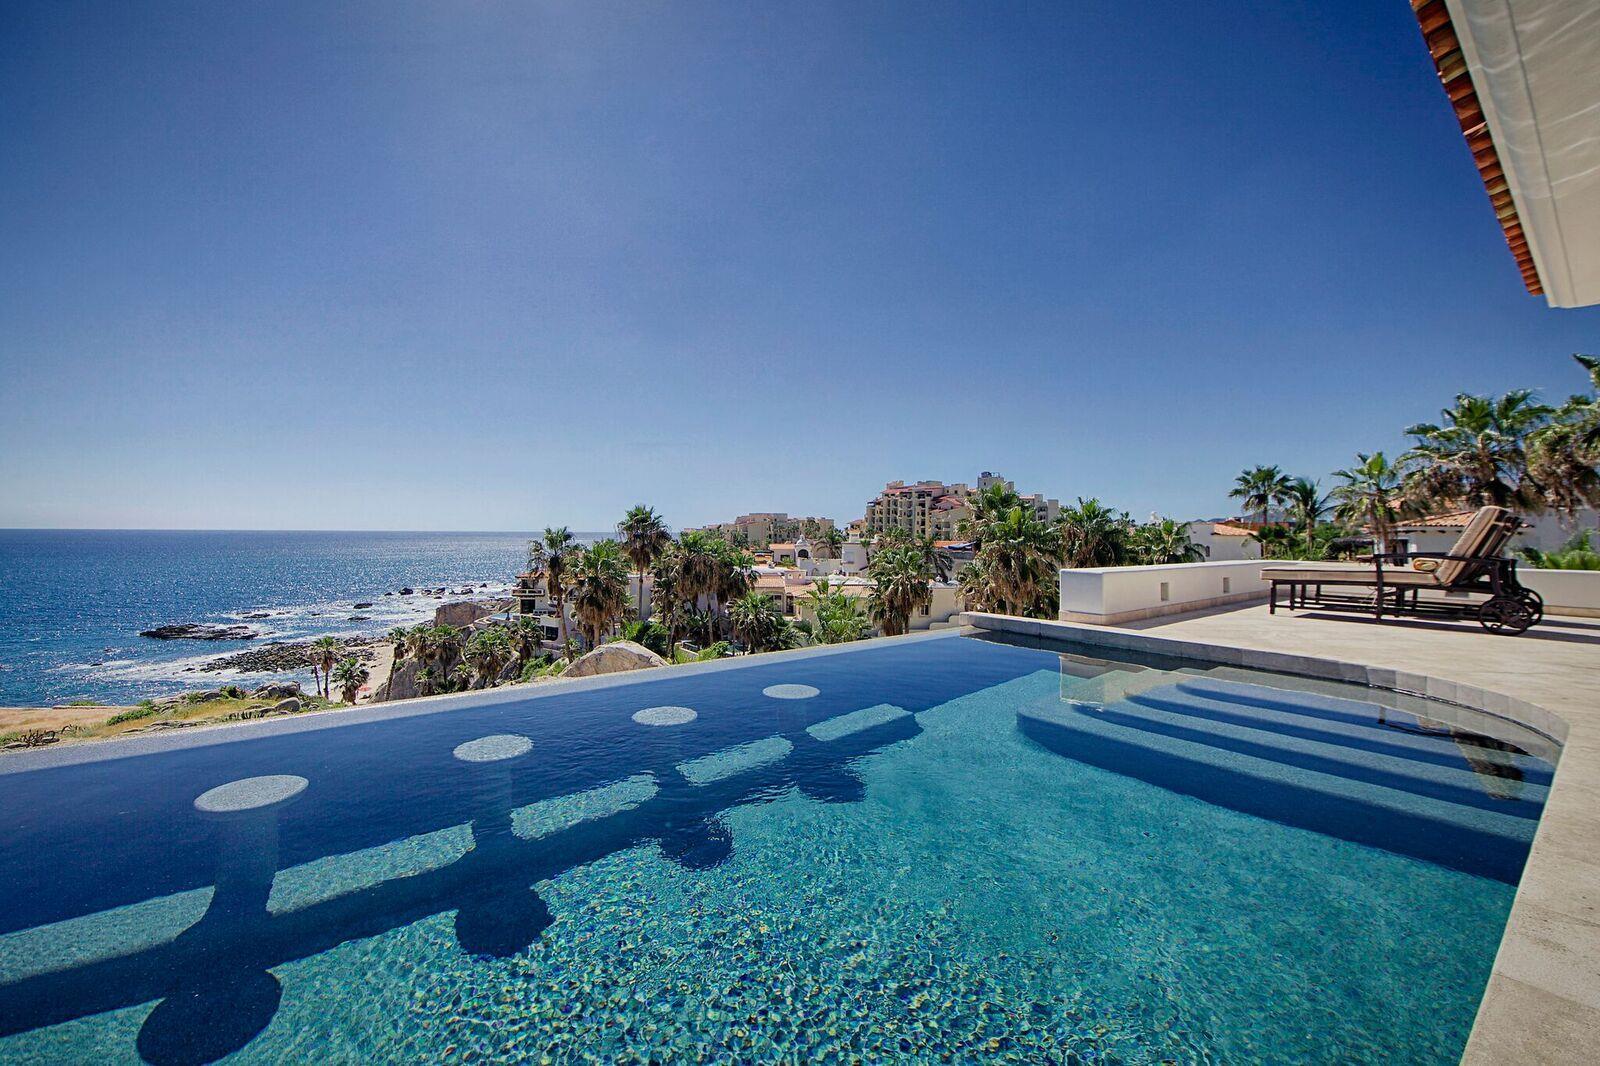 Beachfront / Oceanview,Cabo San Lucas real estate, Cabo San Lucas Baja California Sur real estate